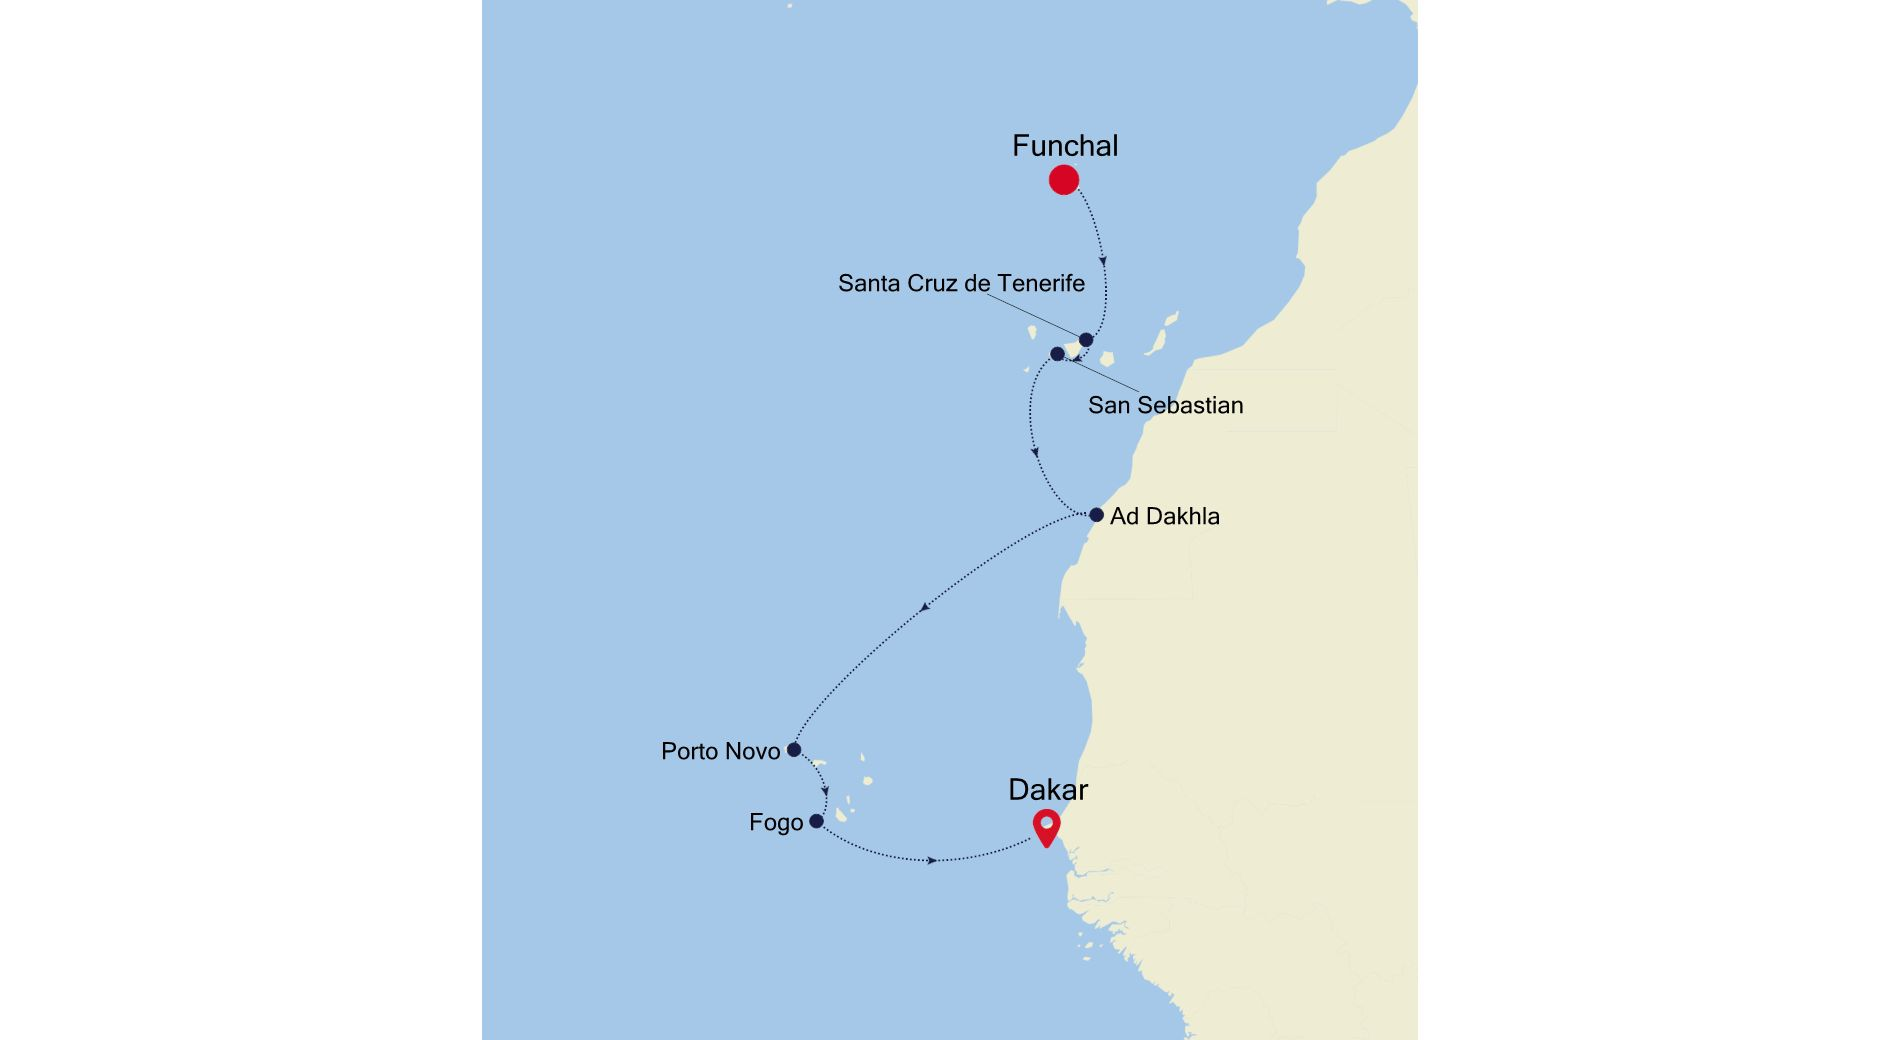 WI211020S09 - Funchal a Dakar